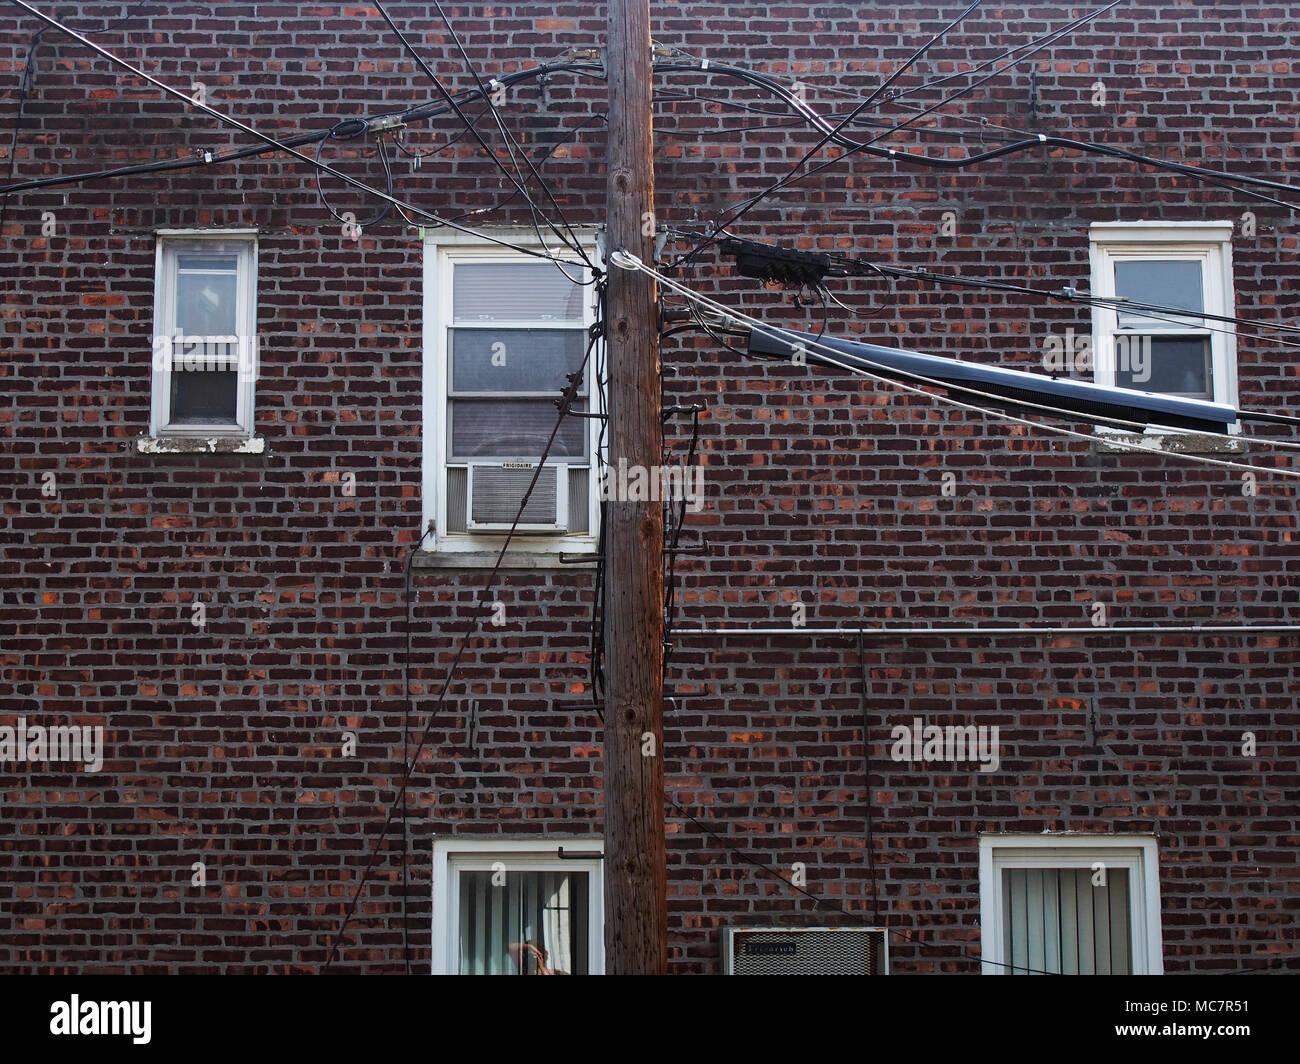 Blick auf Backsteingebäude und Utility Drähte, Brooklyn, USA, 2017 © katharine Andriotis Stockfoto